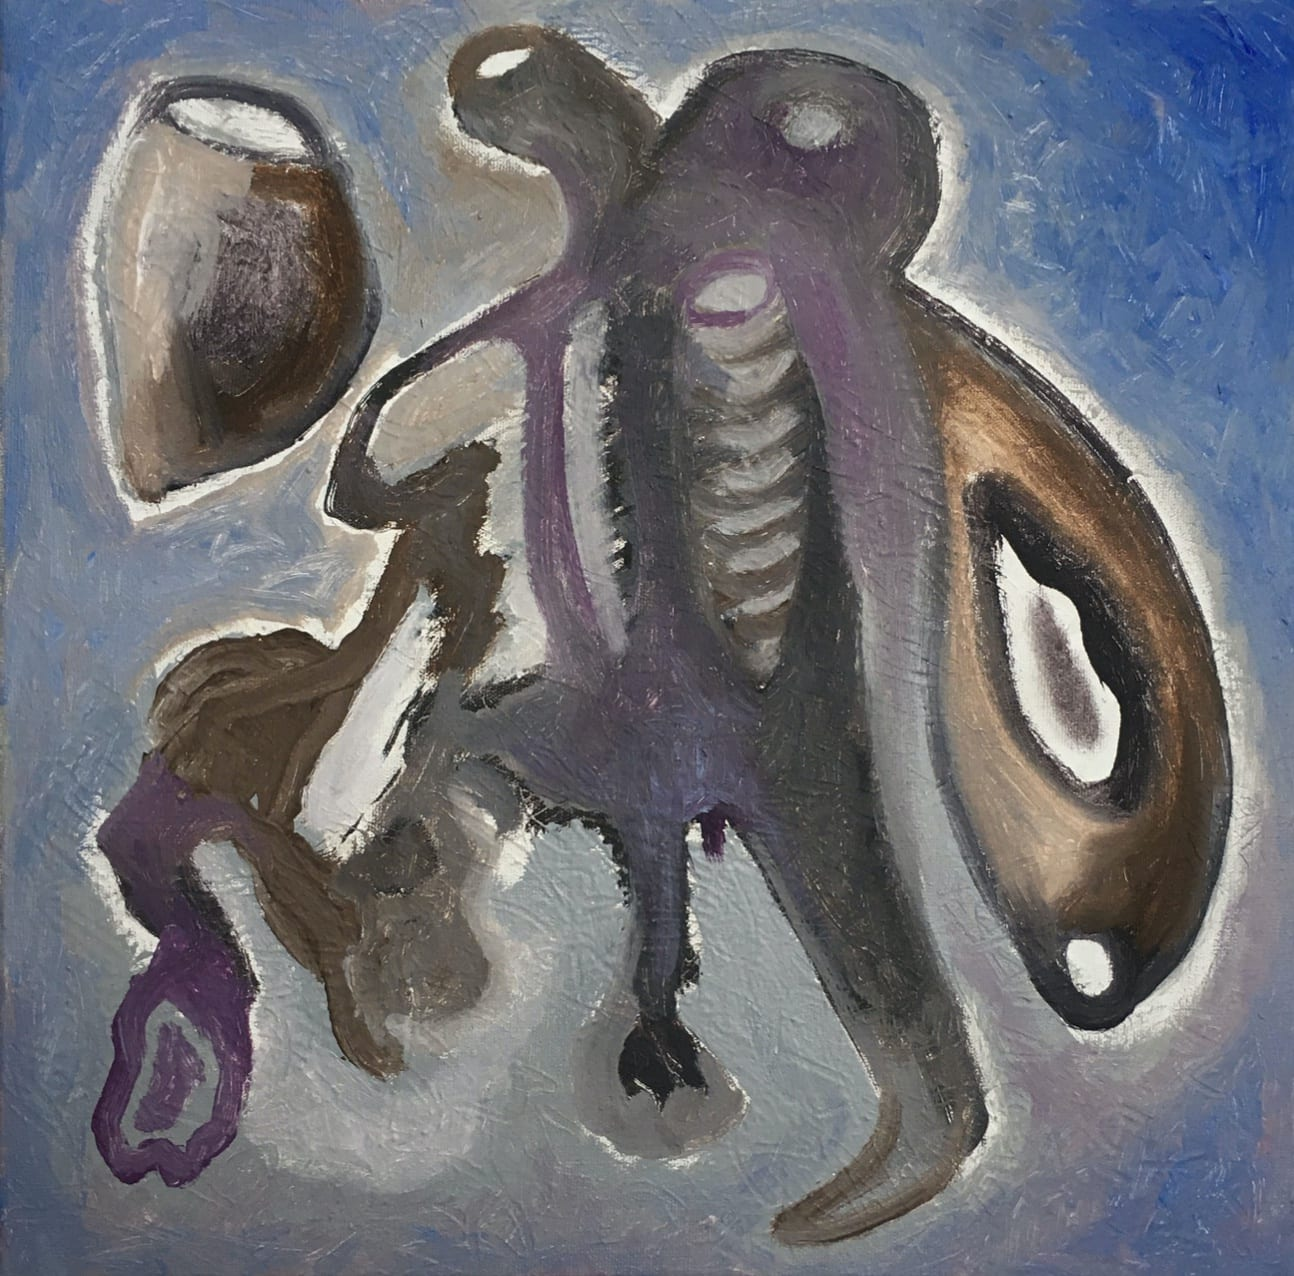 Dudu Santos, Untitled, 2020